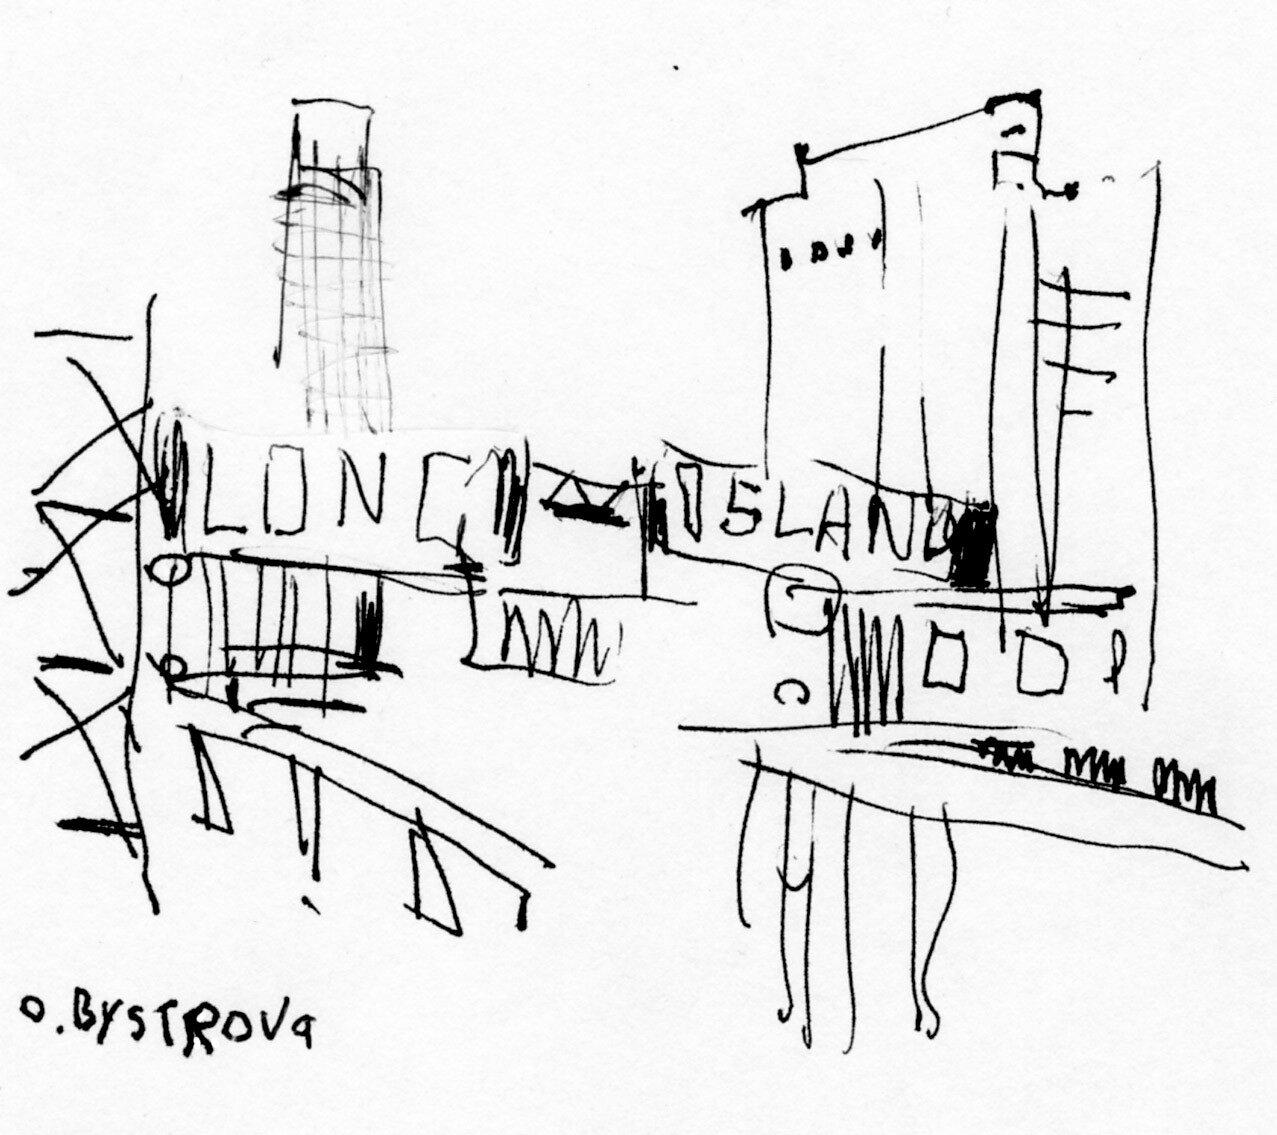 LongIsland_pen.